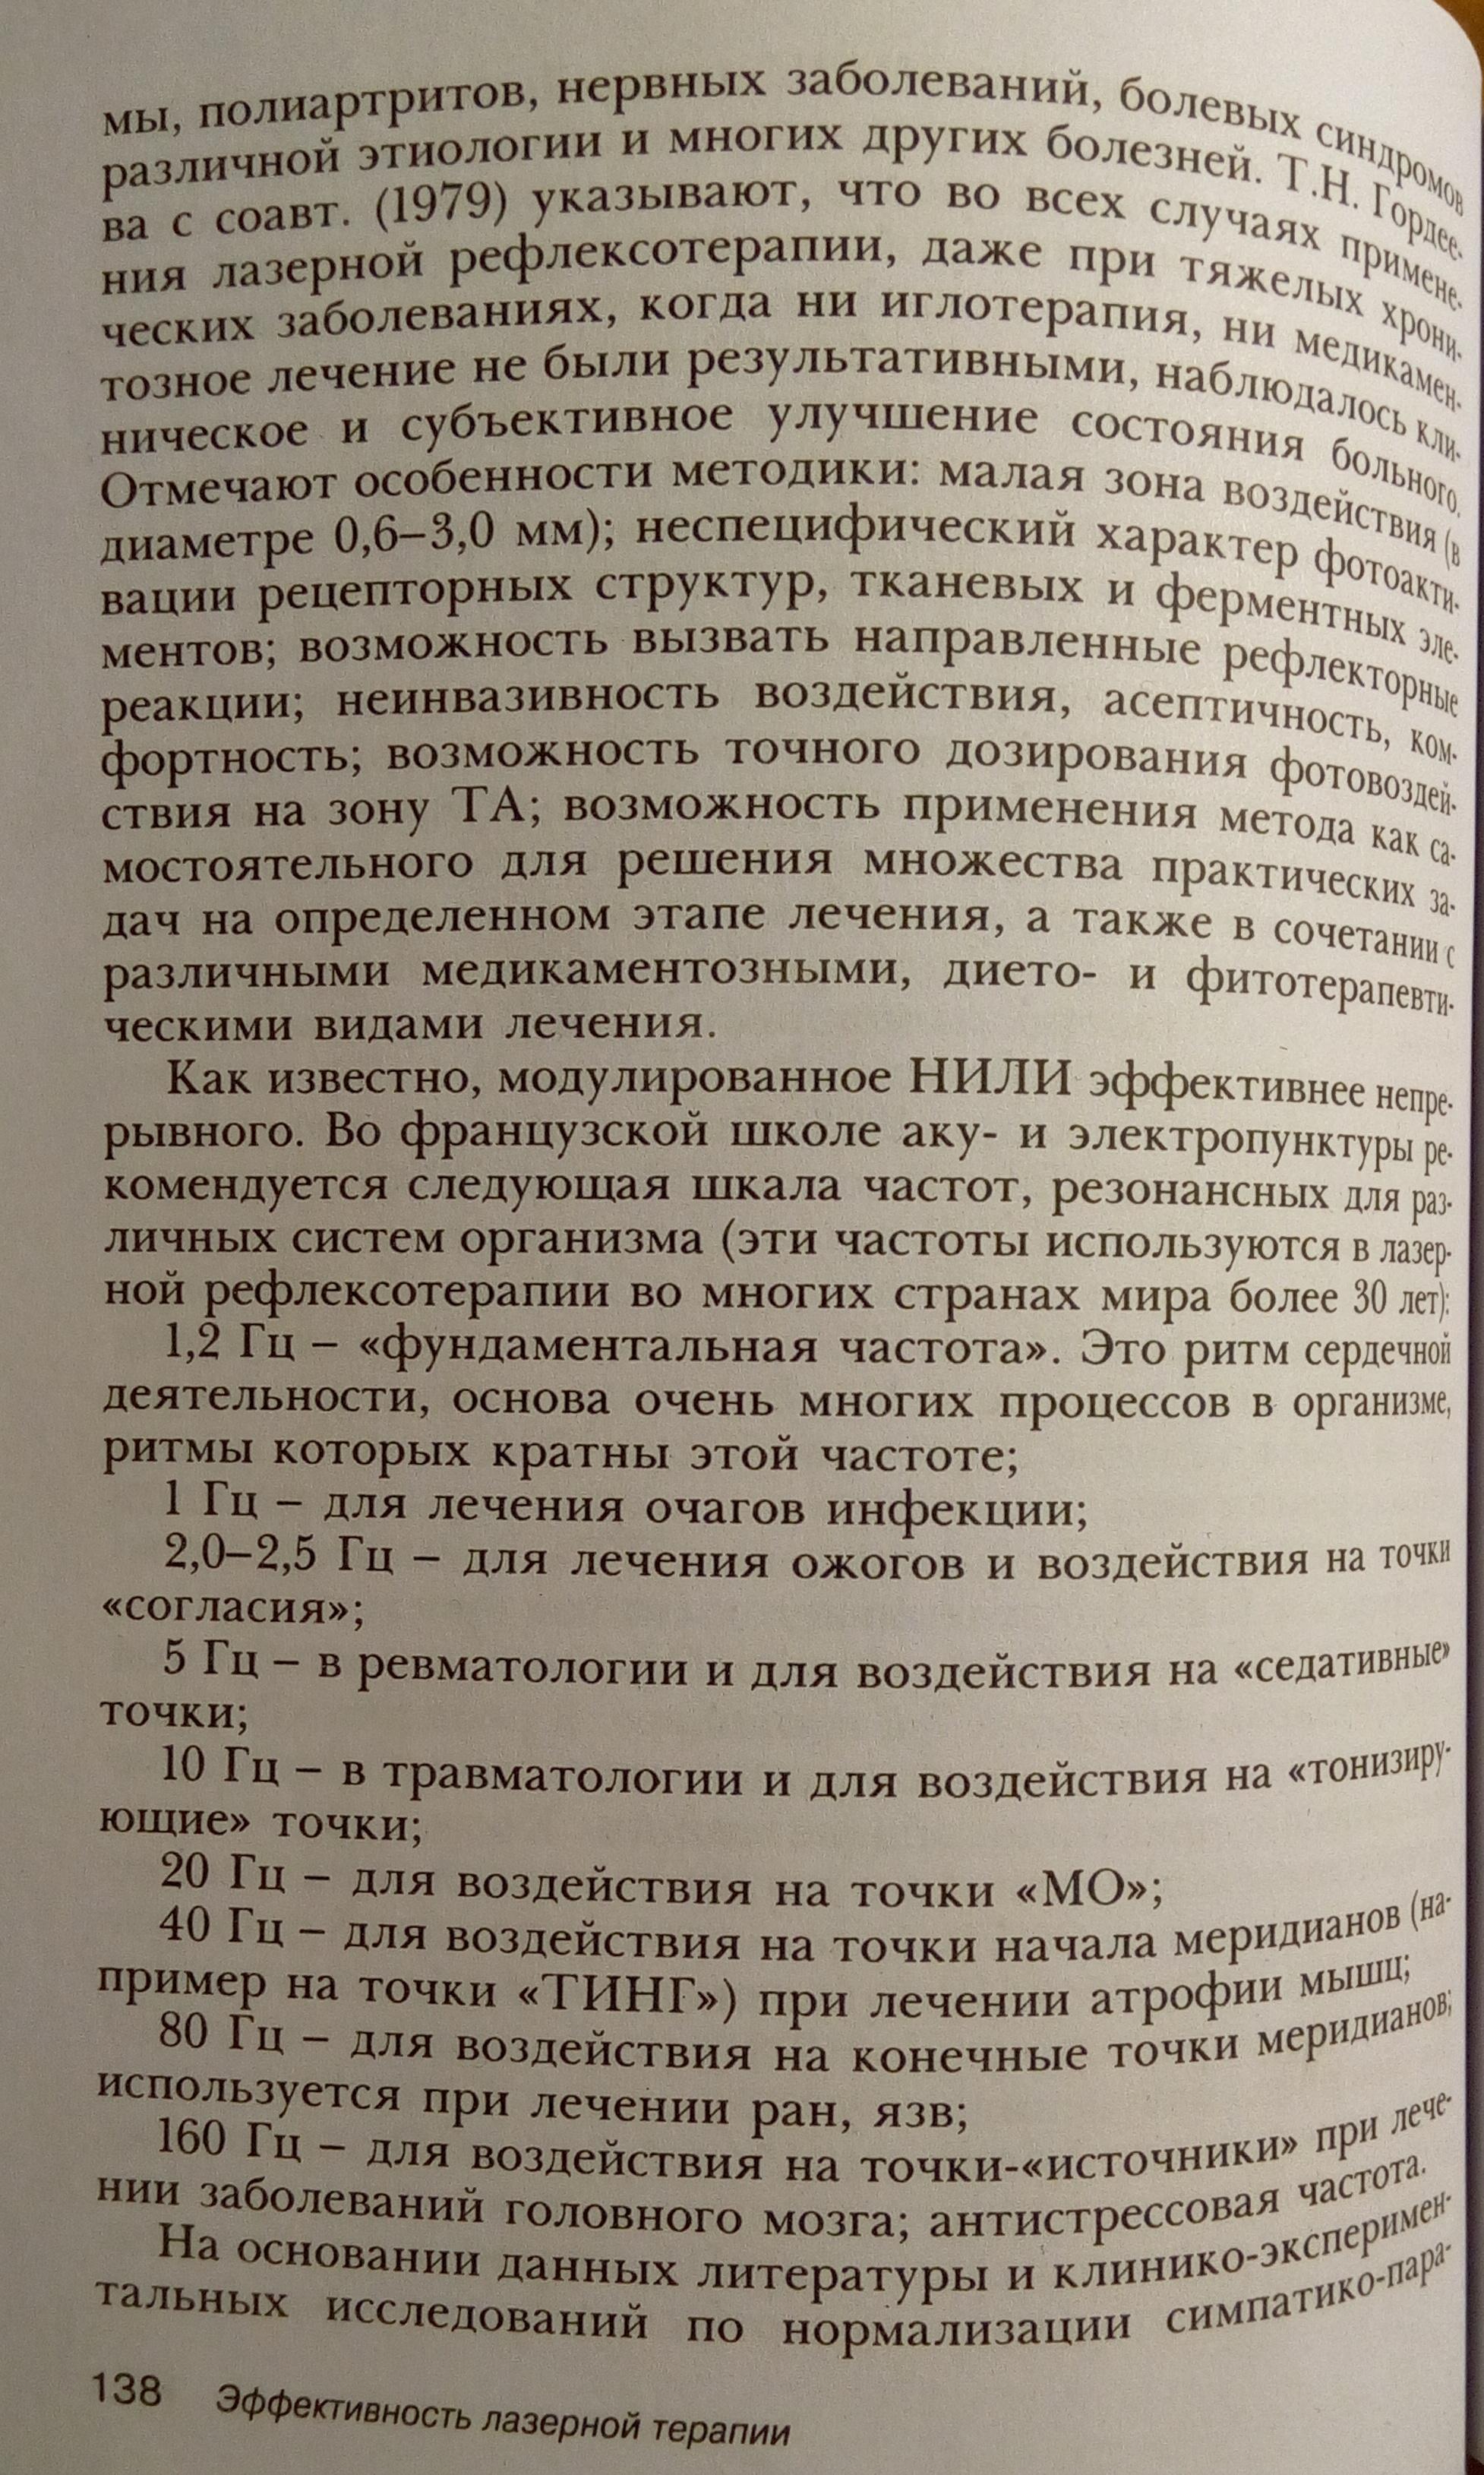 http://s9.uploads.ru/4oKkW.jpg